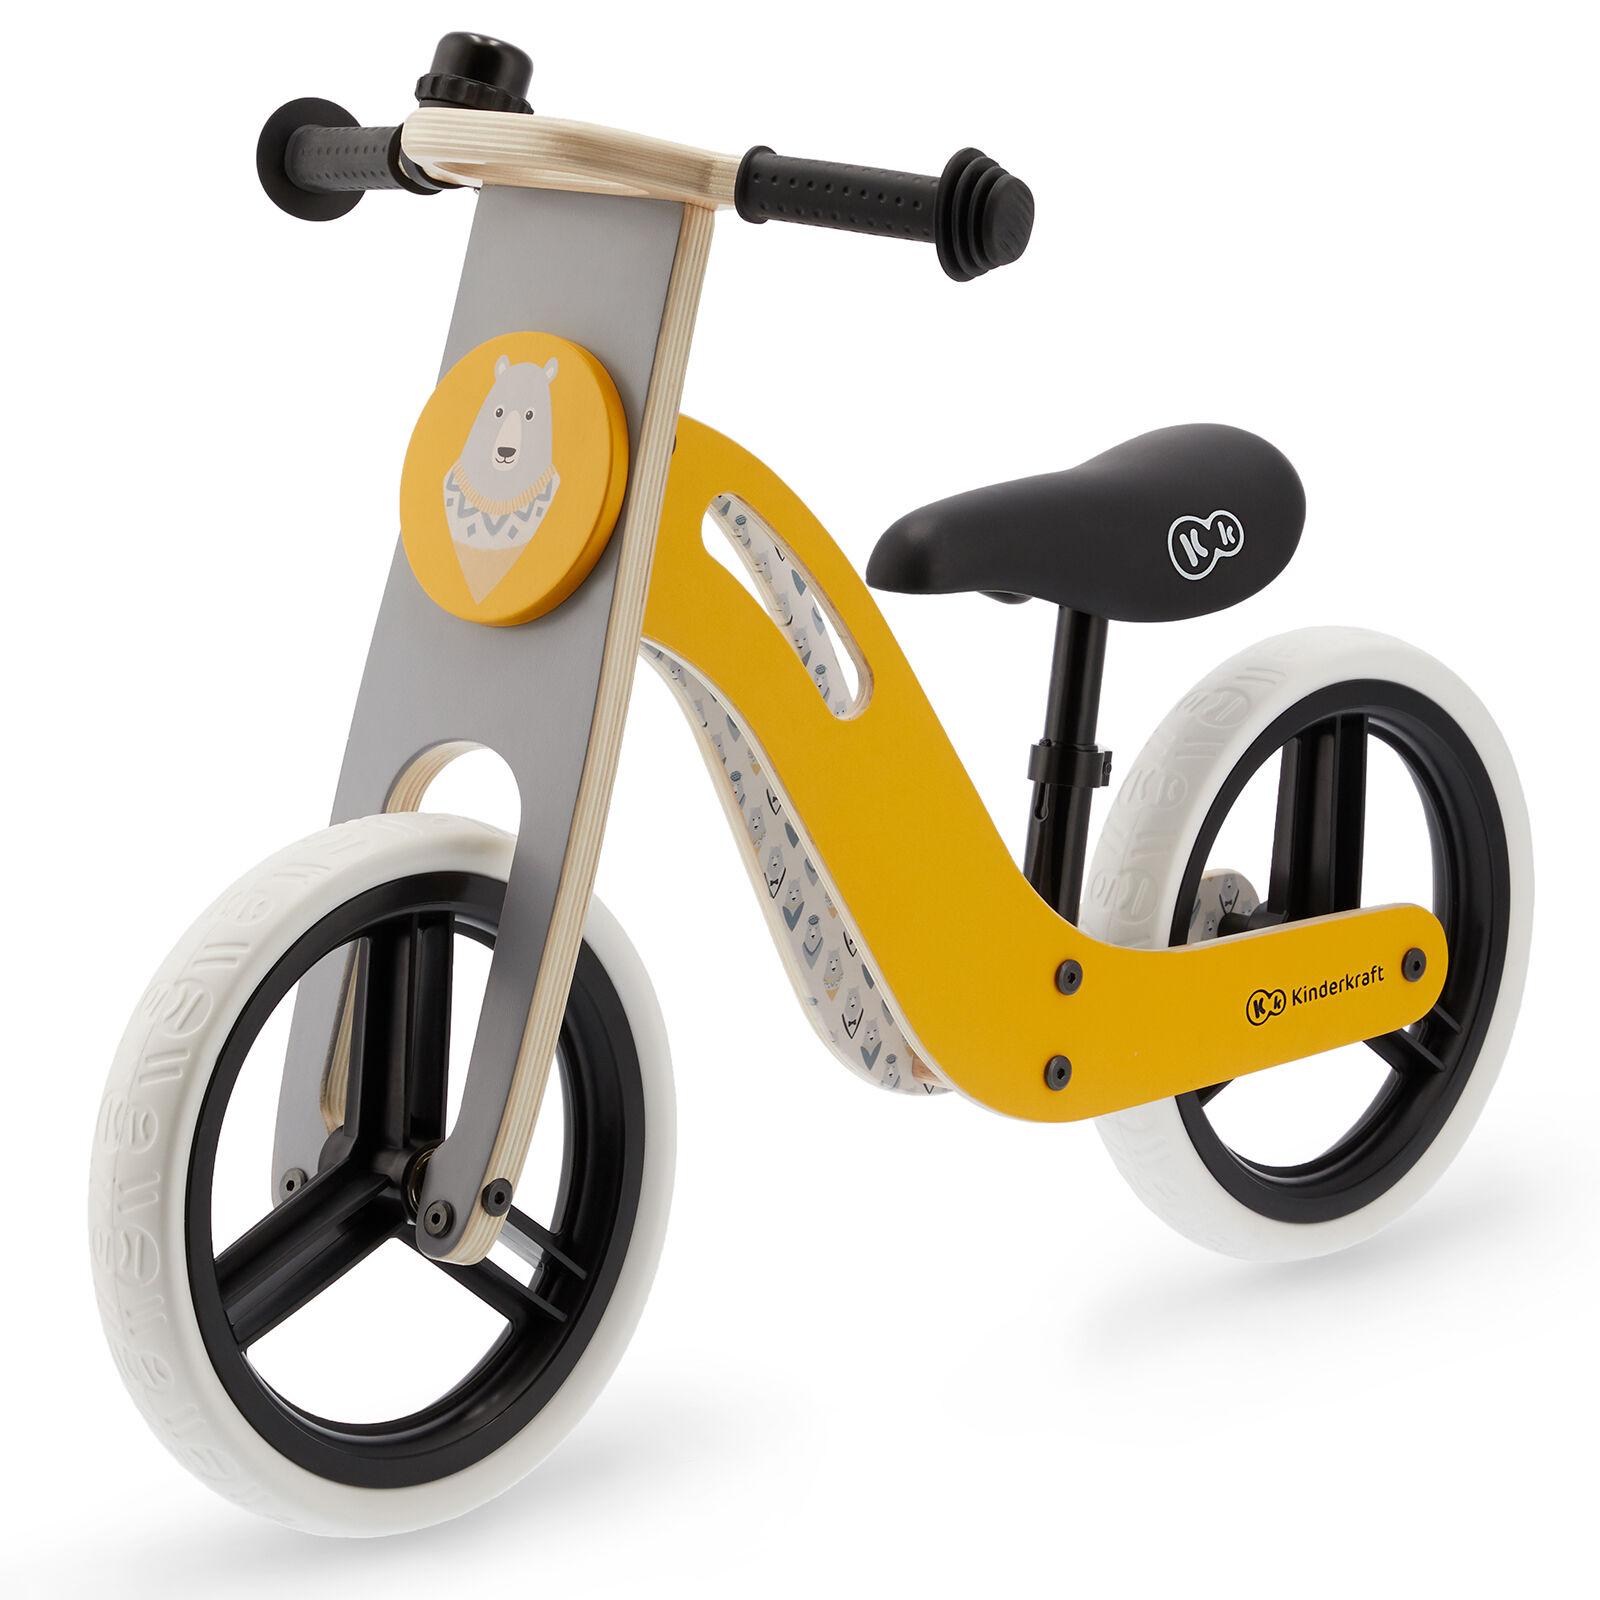 Kinderkraft Uniq Wooden Balance Bike - Honey